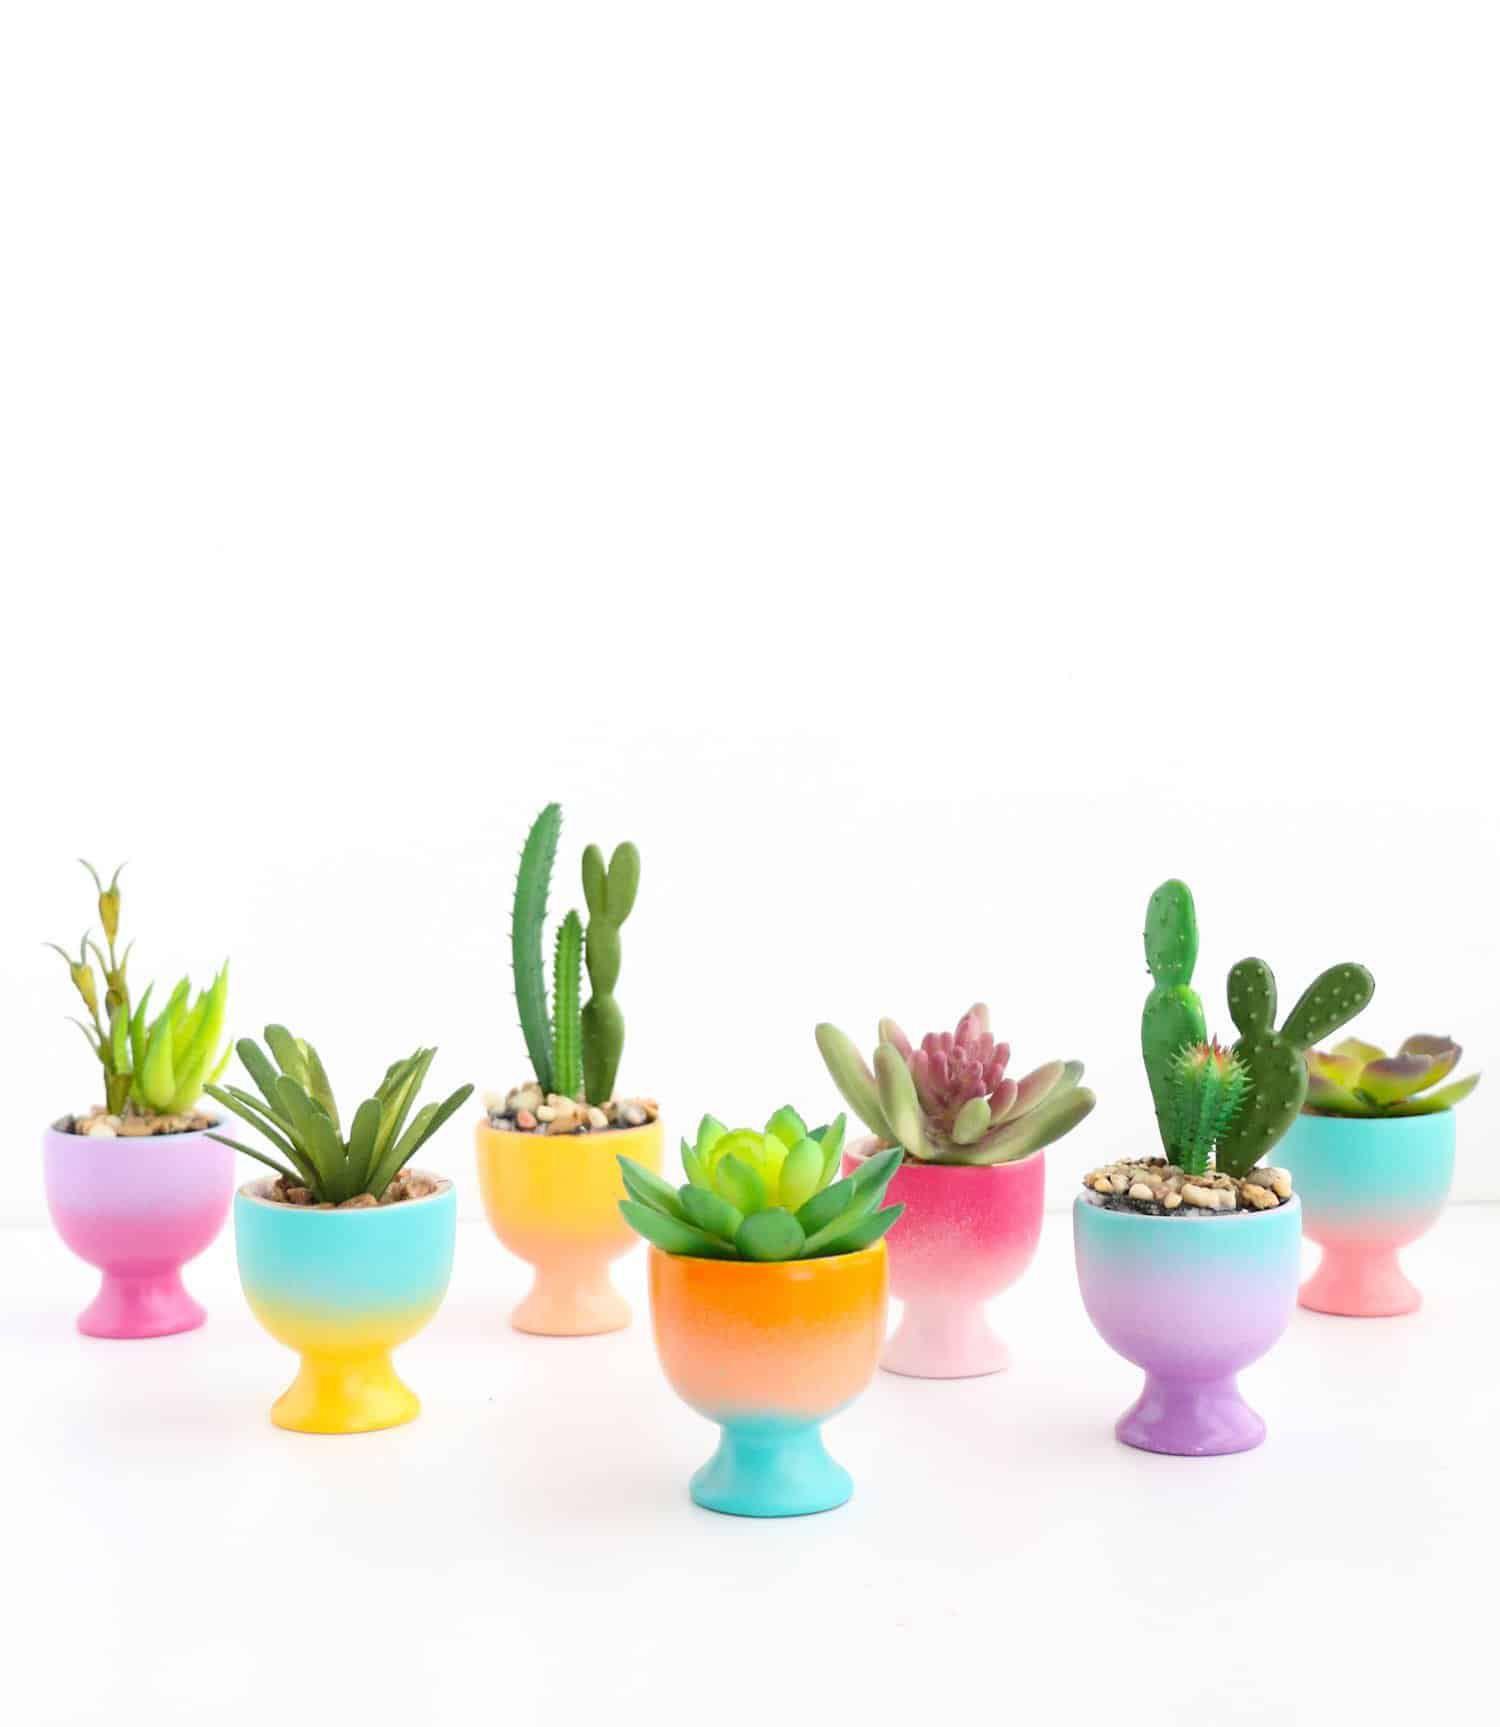 gradient egg plants